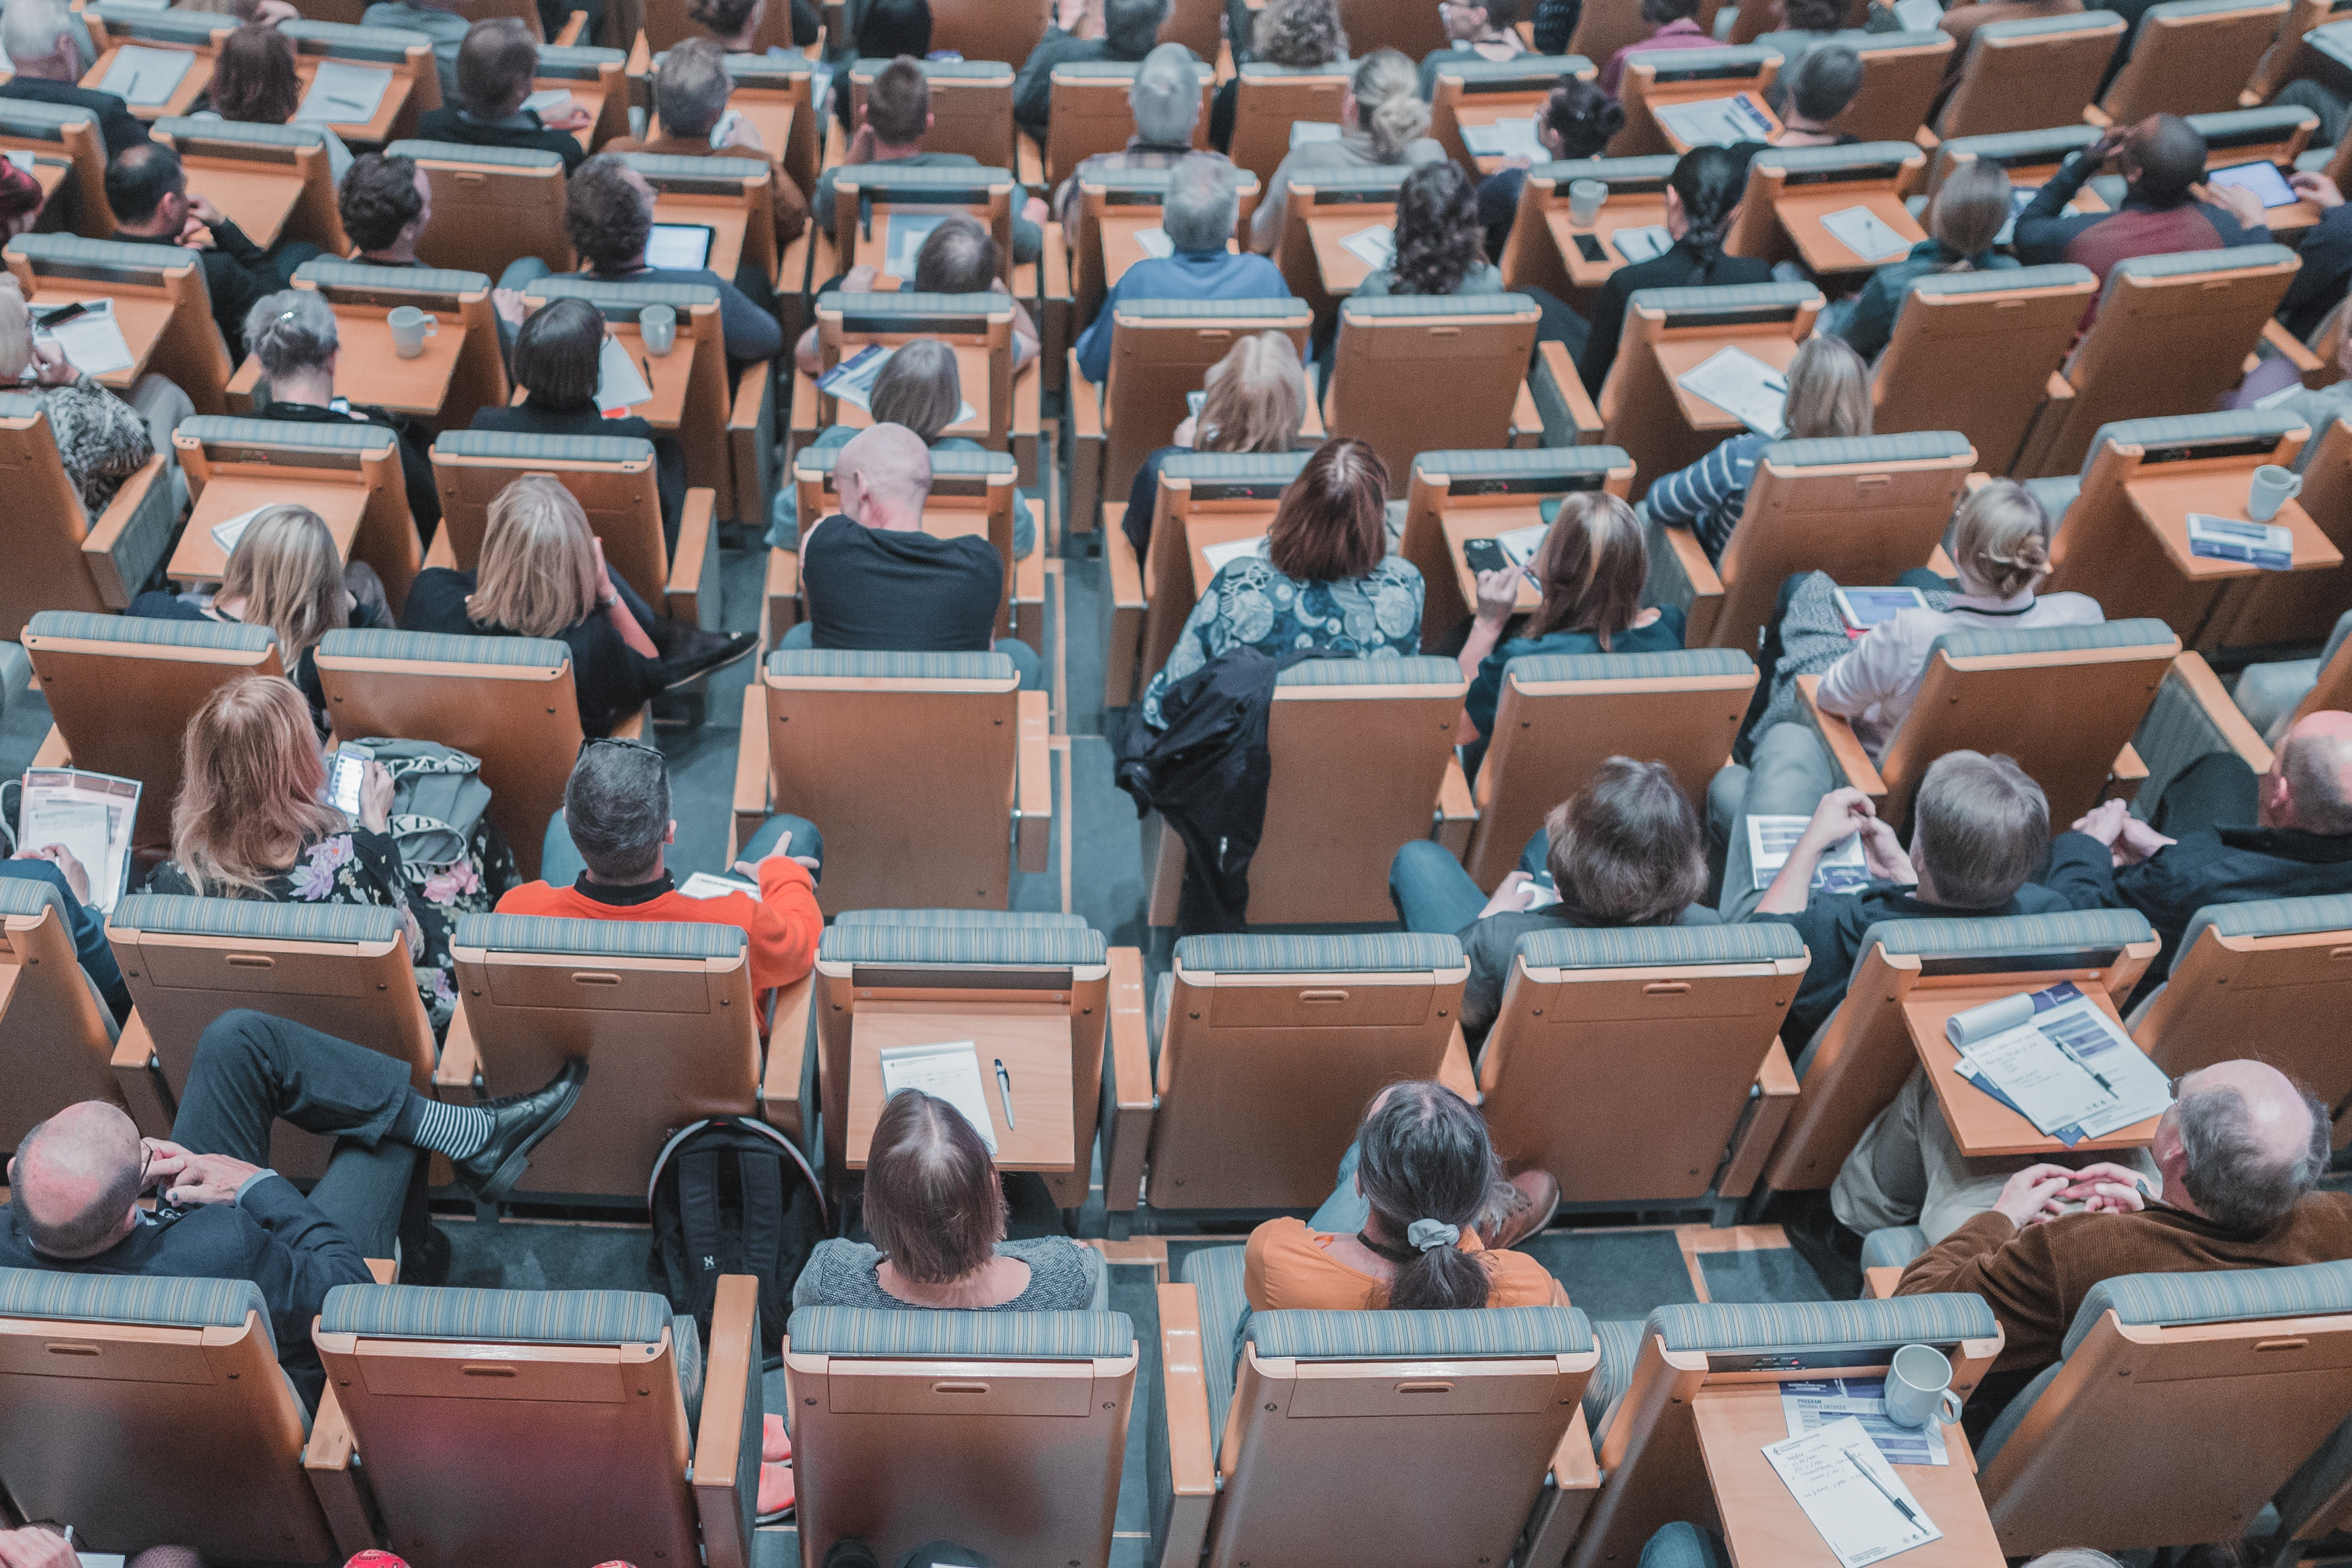 Университет Людвига-Максимилиана. Учеба на факультете Betriebswirtschaftslehre (BWL)